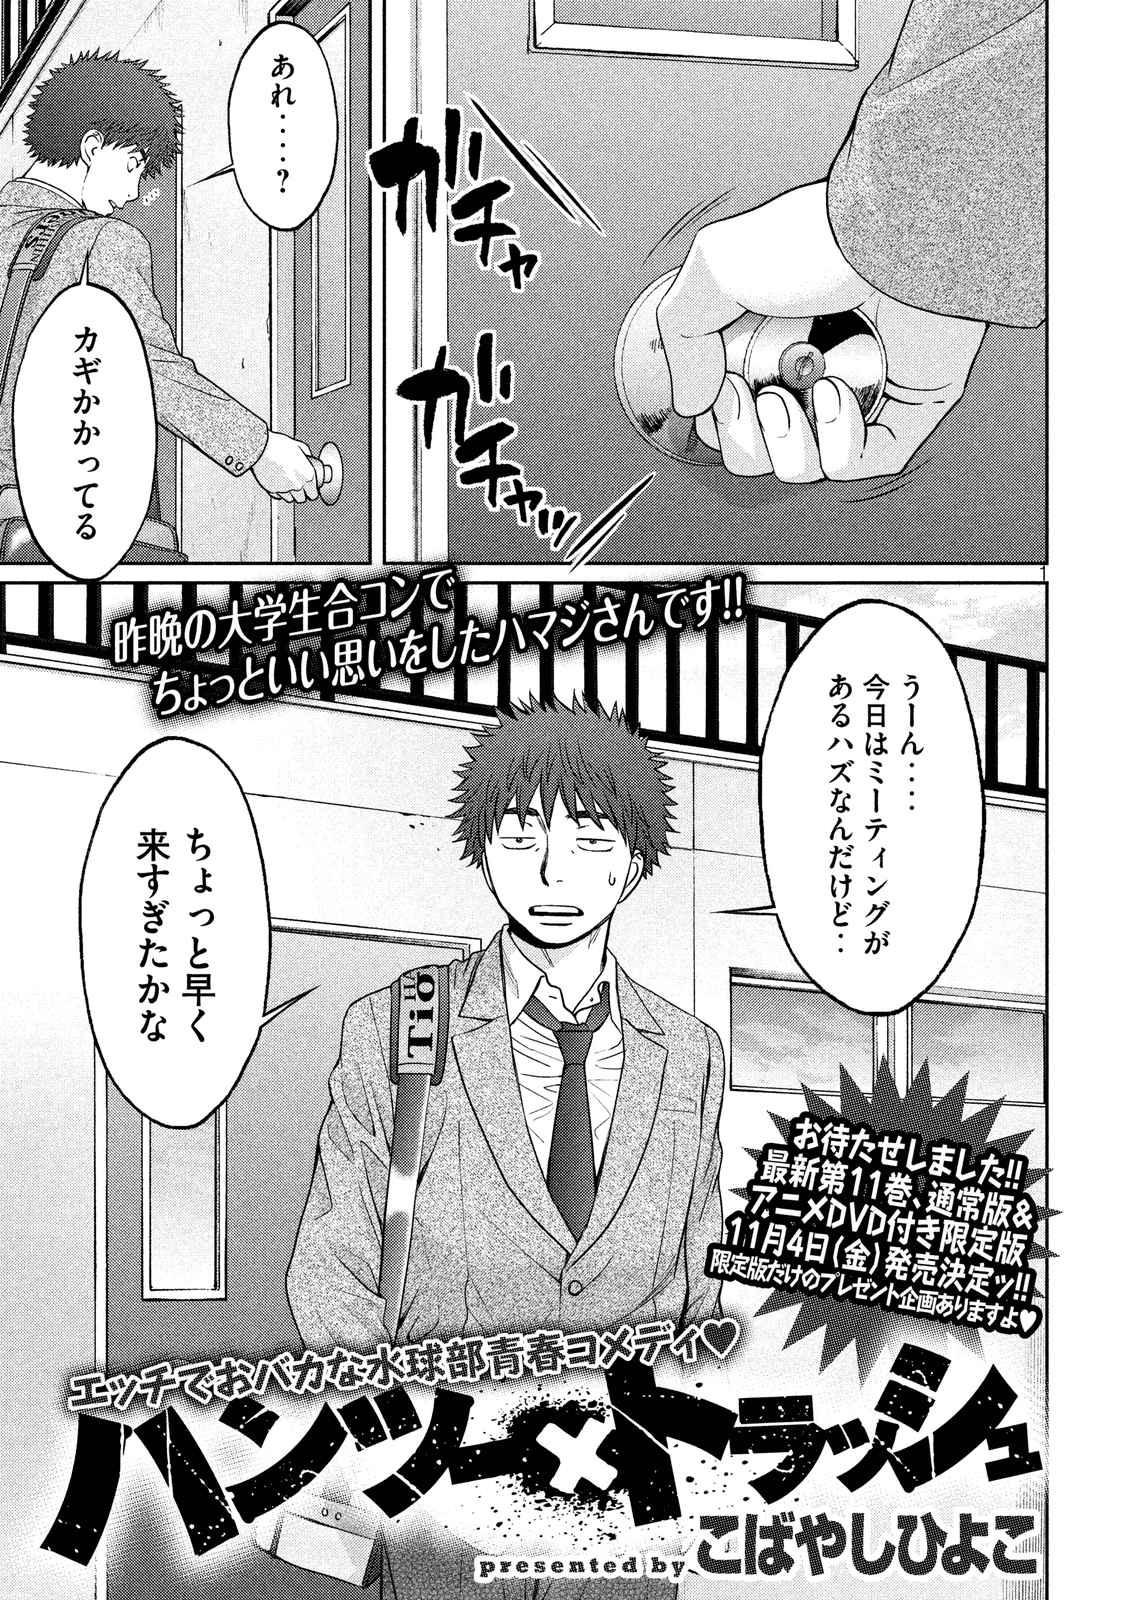 Hantsu x Trash - Chapter 124 - Page 1